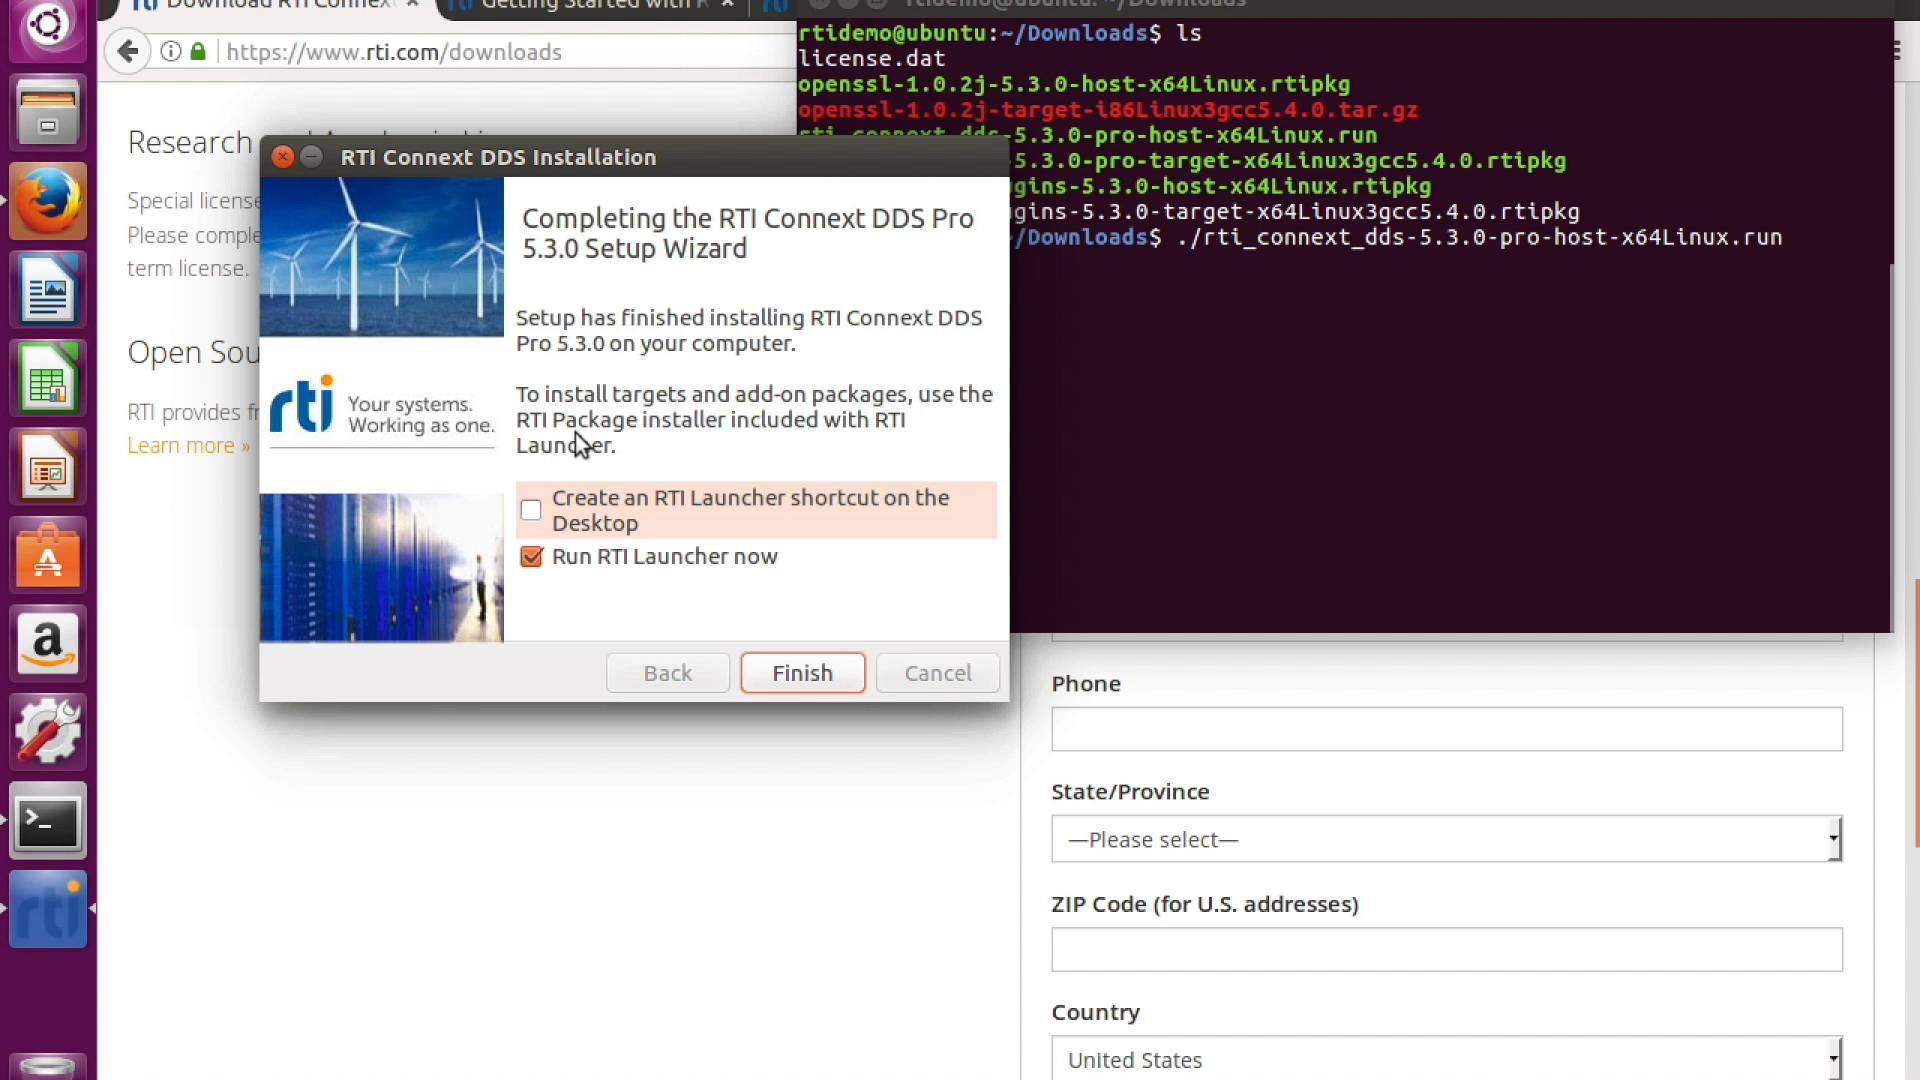 Connext DDS Installation Video Tutorial